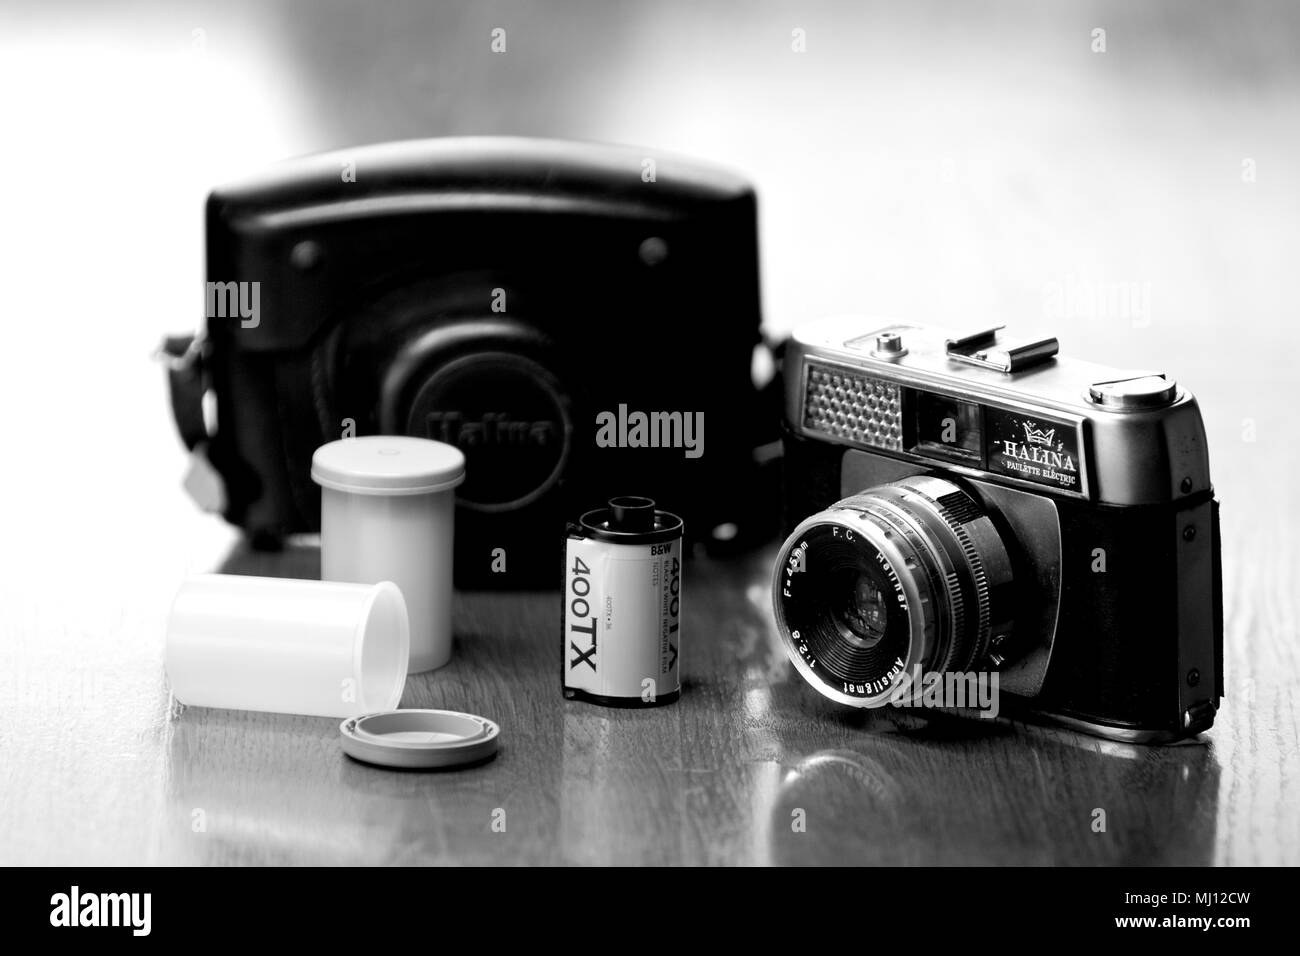 A 35mm Halina Paulette Electric Camera c1967. - Stock Image